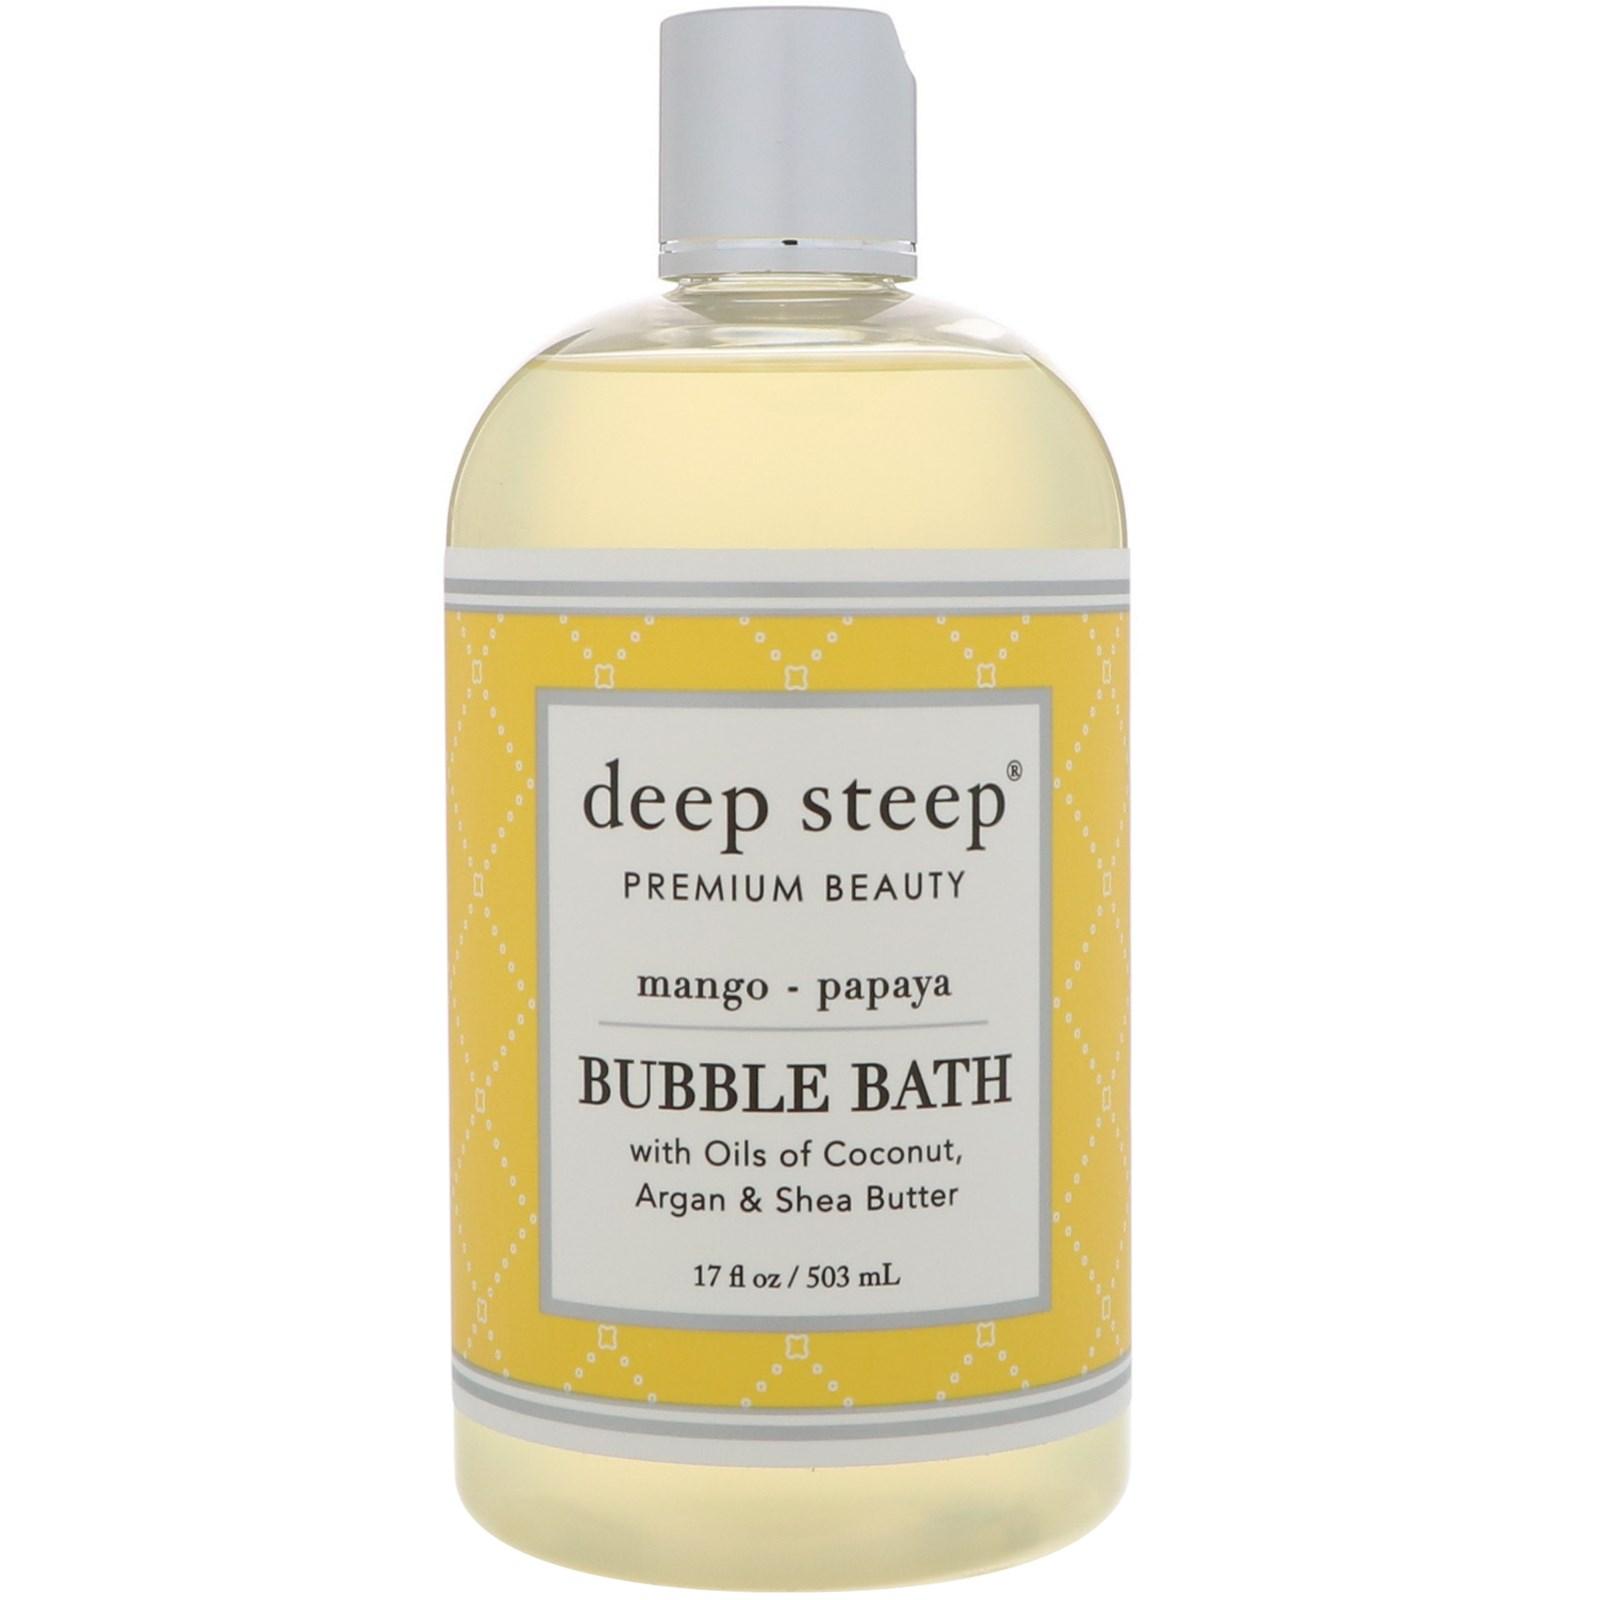 Deep Steep, Bubble Bath, Mango - Papaya, 17 fl oz (503 ml)